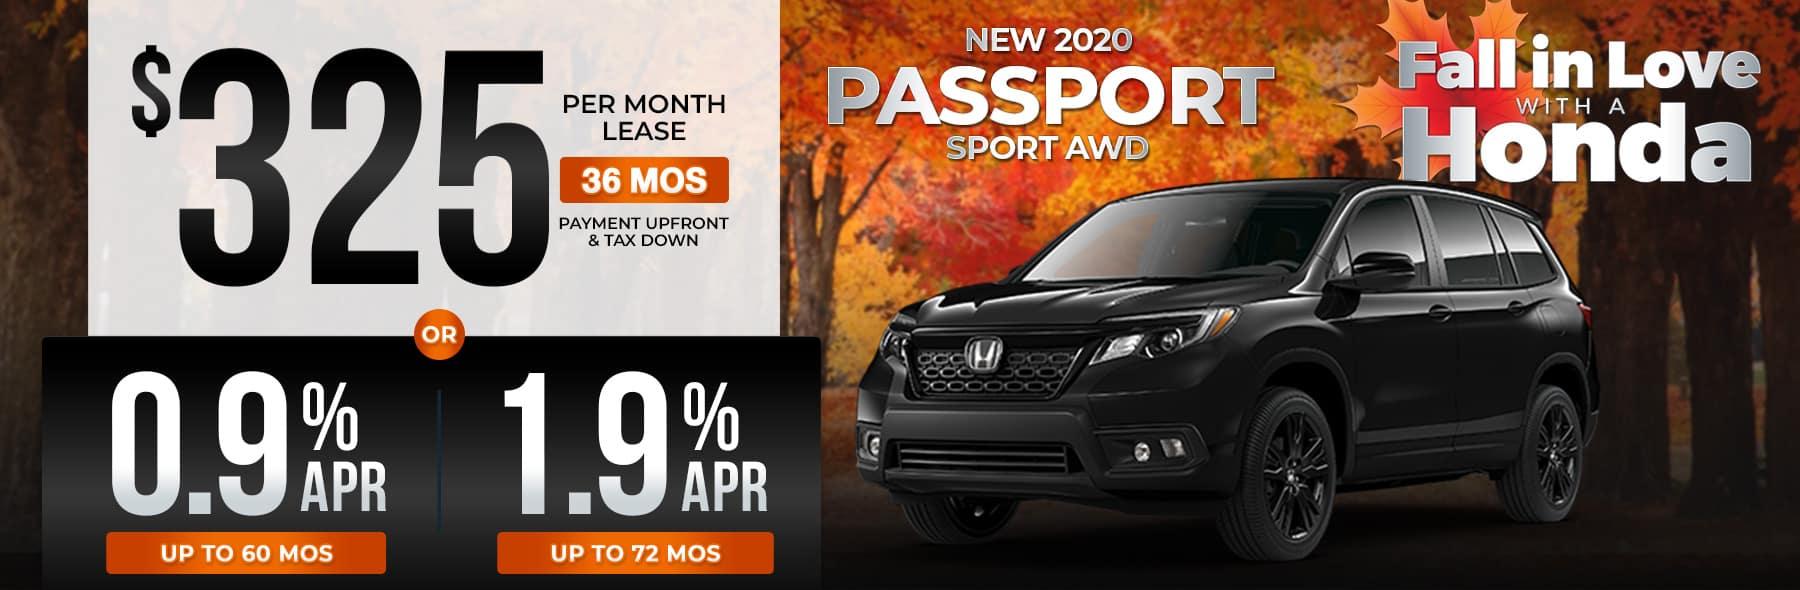 IGH-Oct20-HP-Passport-v1